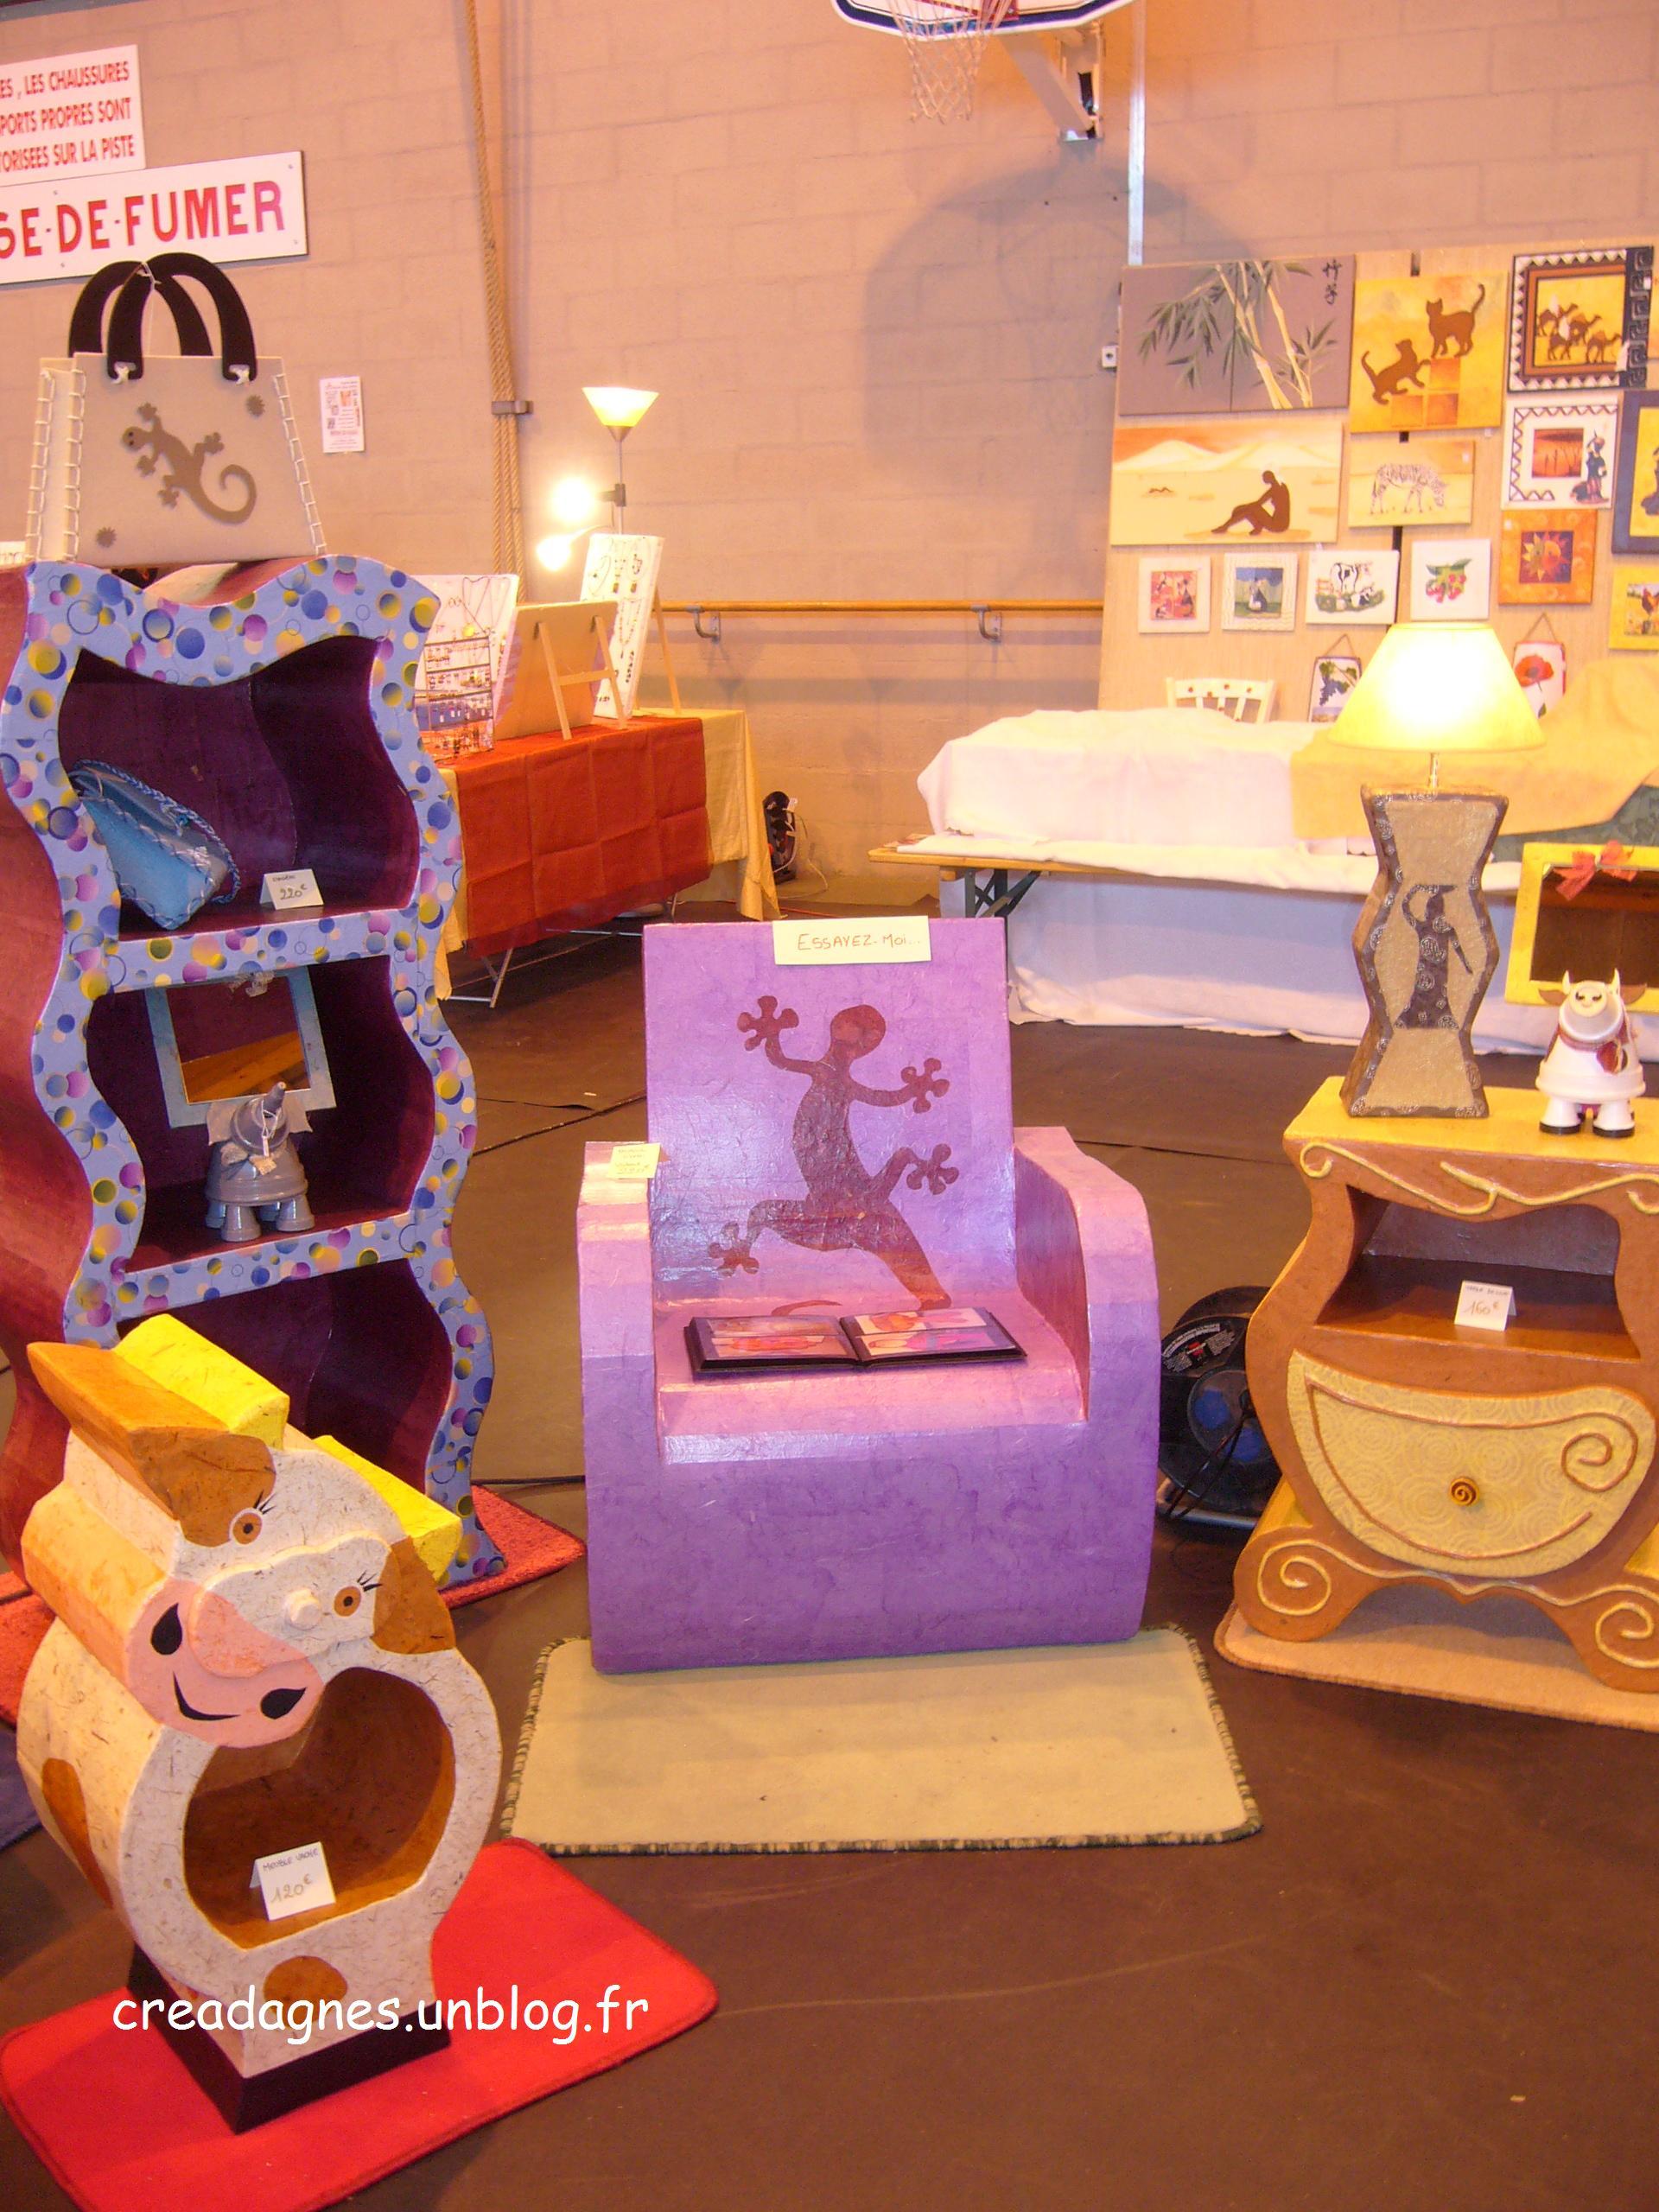 cr ation de mobilier et d objets d co en carton. Black Bedroom Furniture Sets. Home Design Ideas